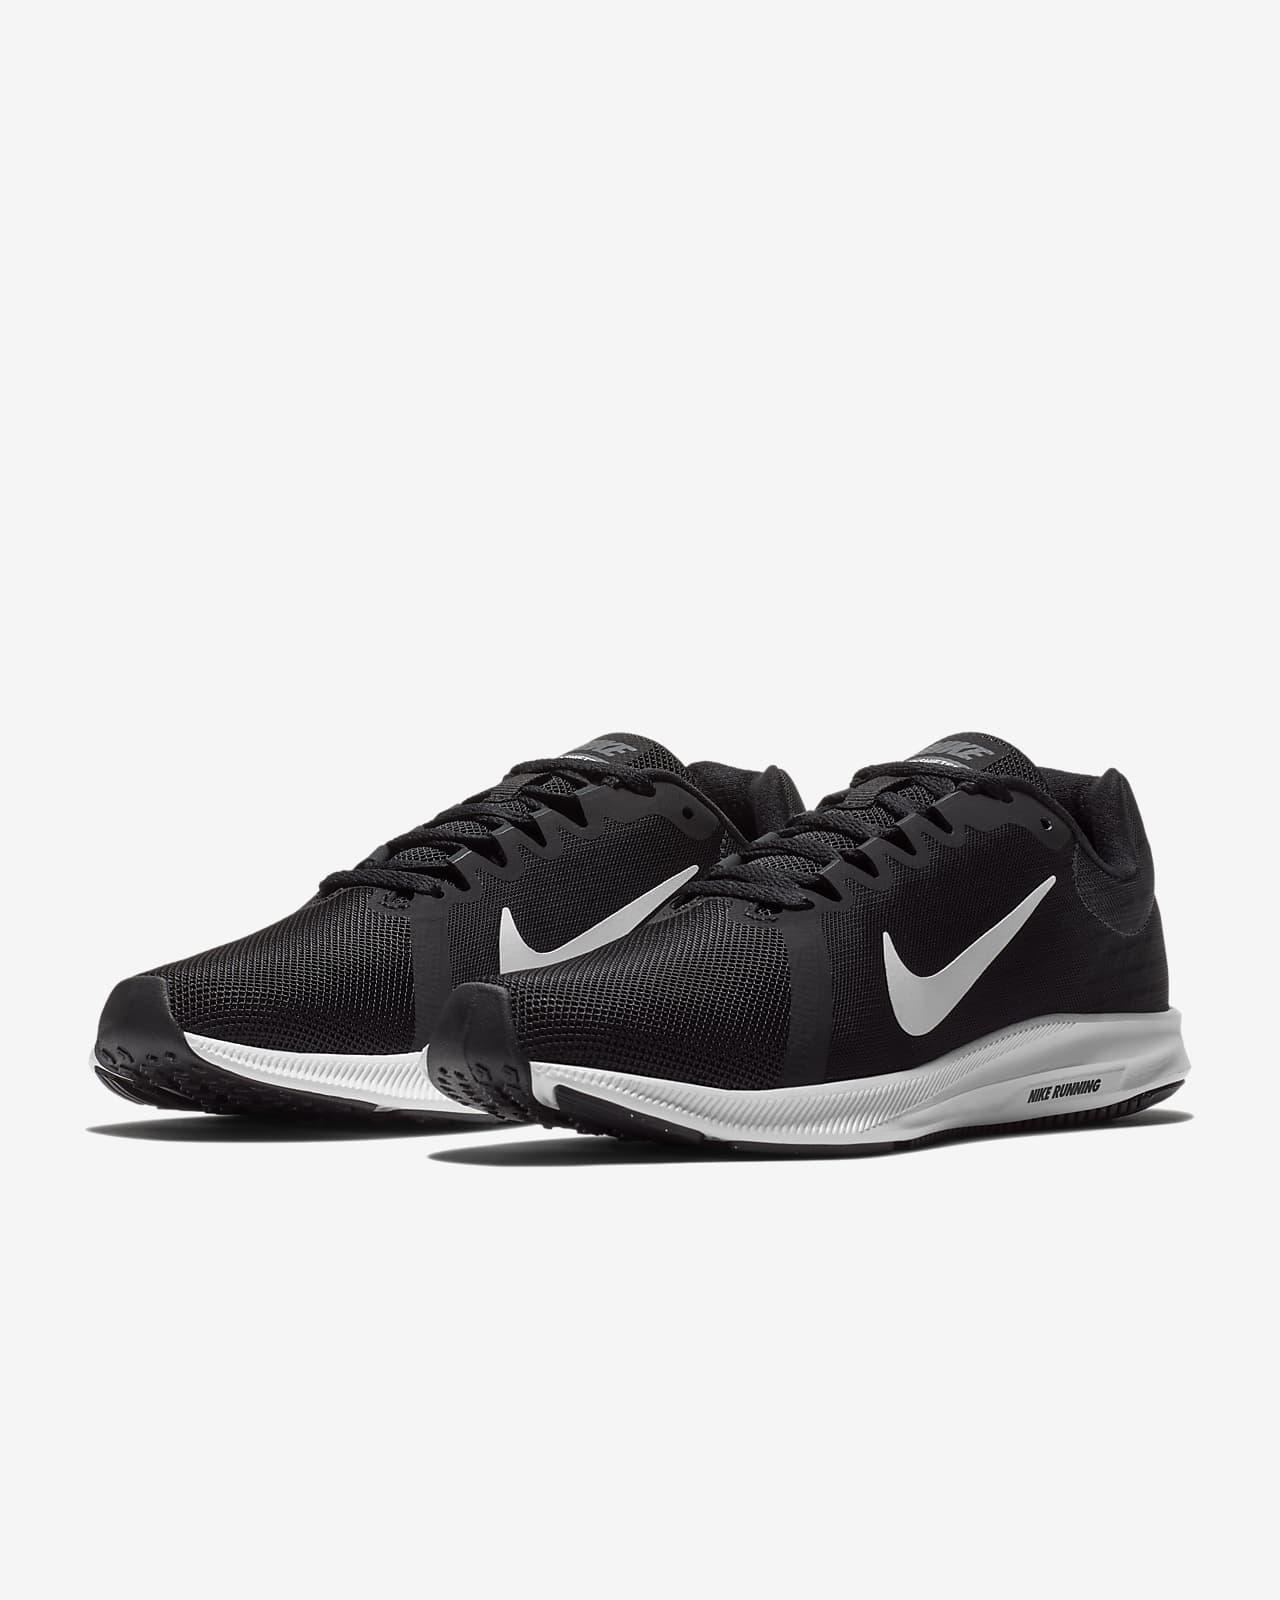 capitalismo Antagonista Empresa  Nike Downshifter 8 Women's Running Shoe. Nike IN